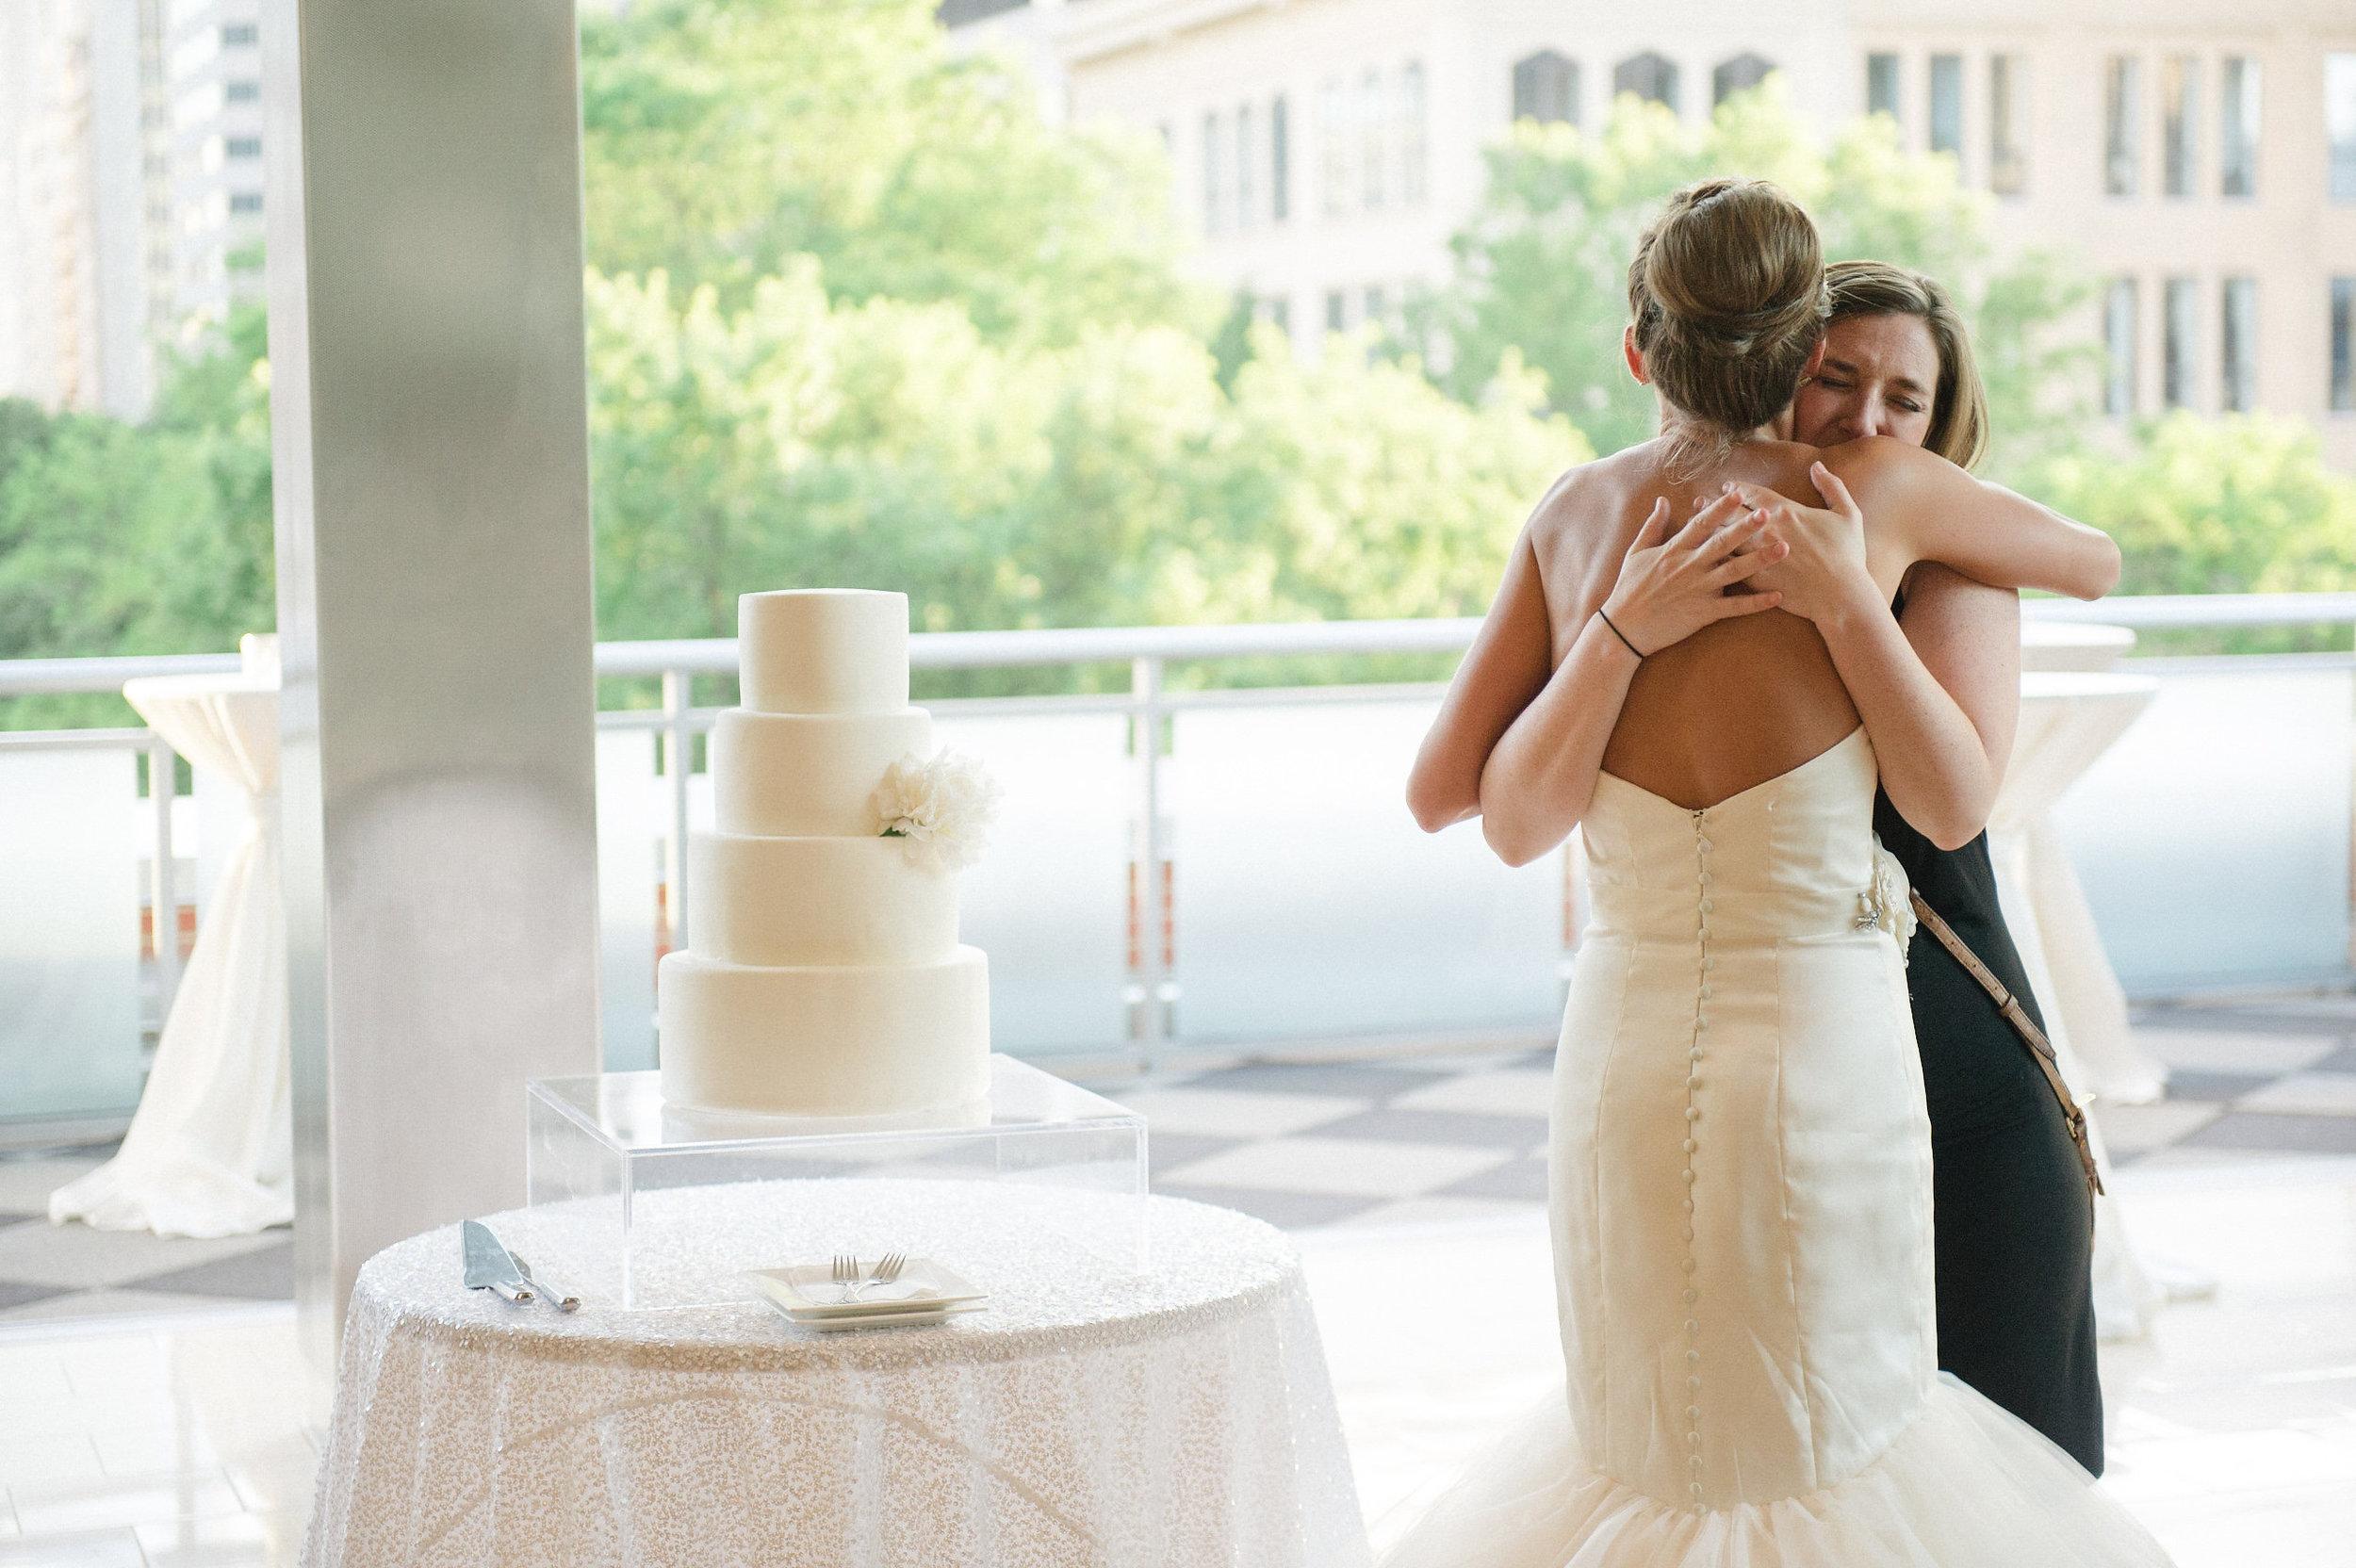 shelby&jordan|smitten&hooked|wedding|roomreveal-031.jpg